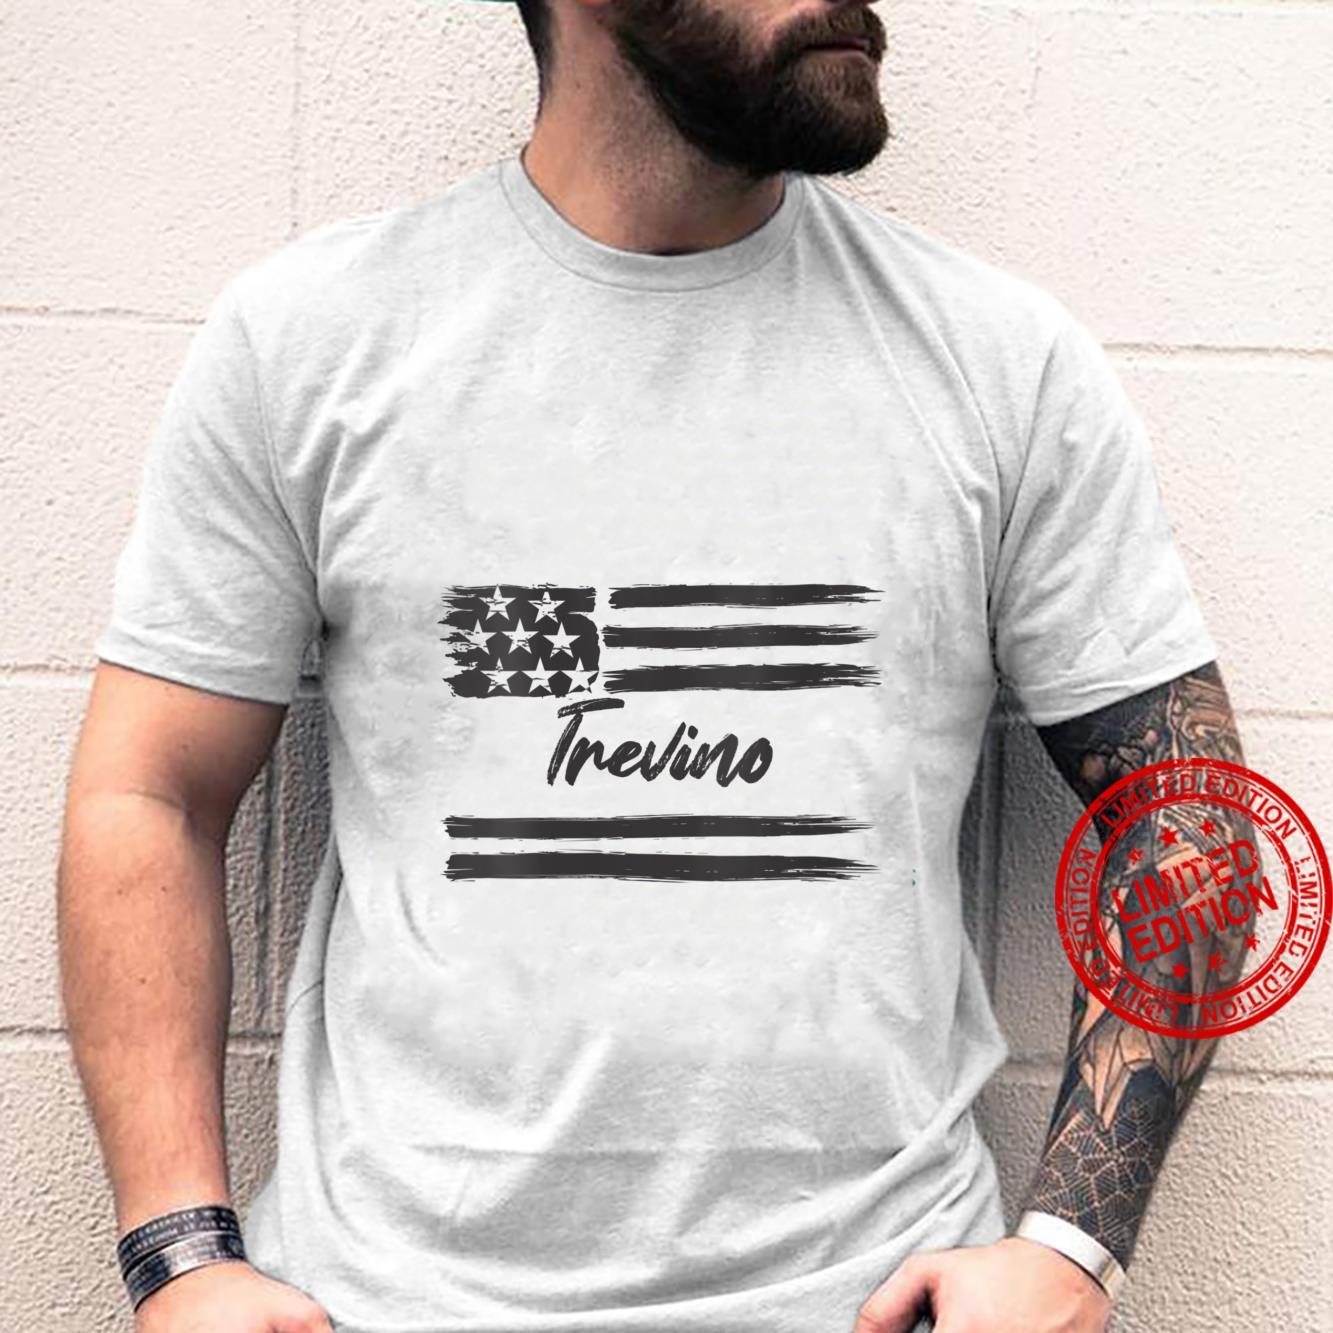 Womens Trevino Personalized Name, Stars and Stripes, USA Flag Shirt